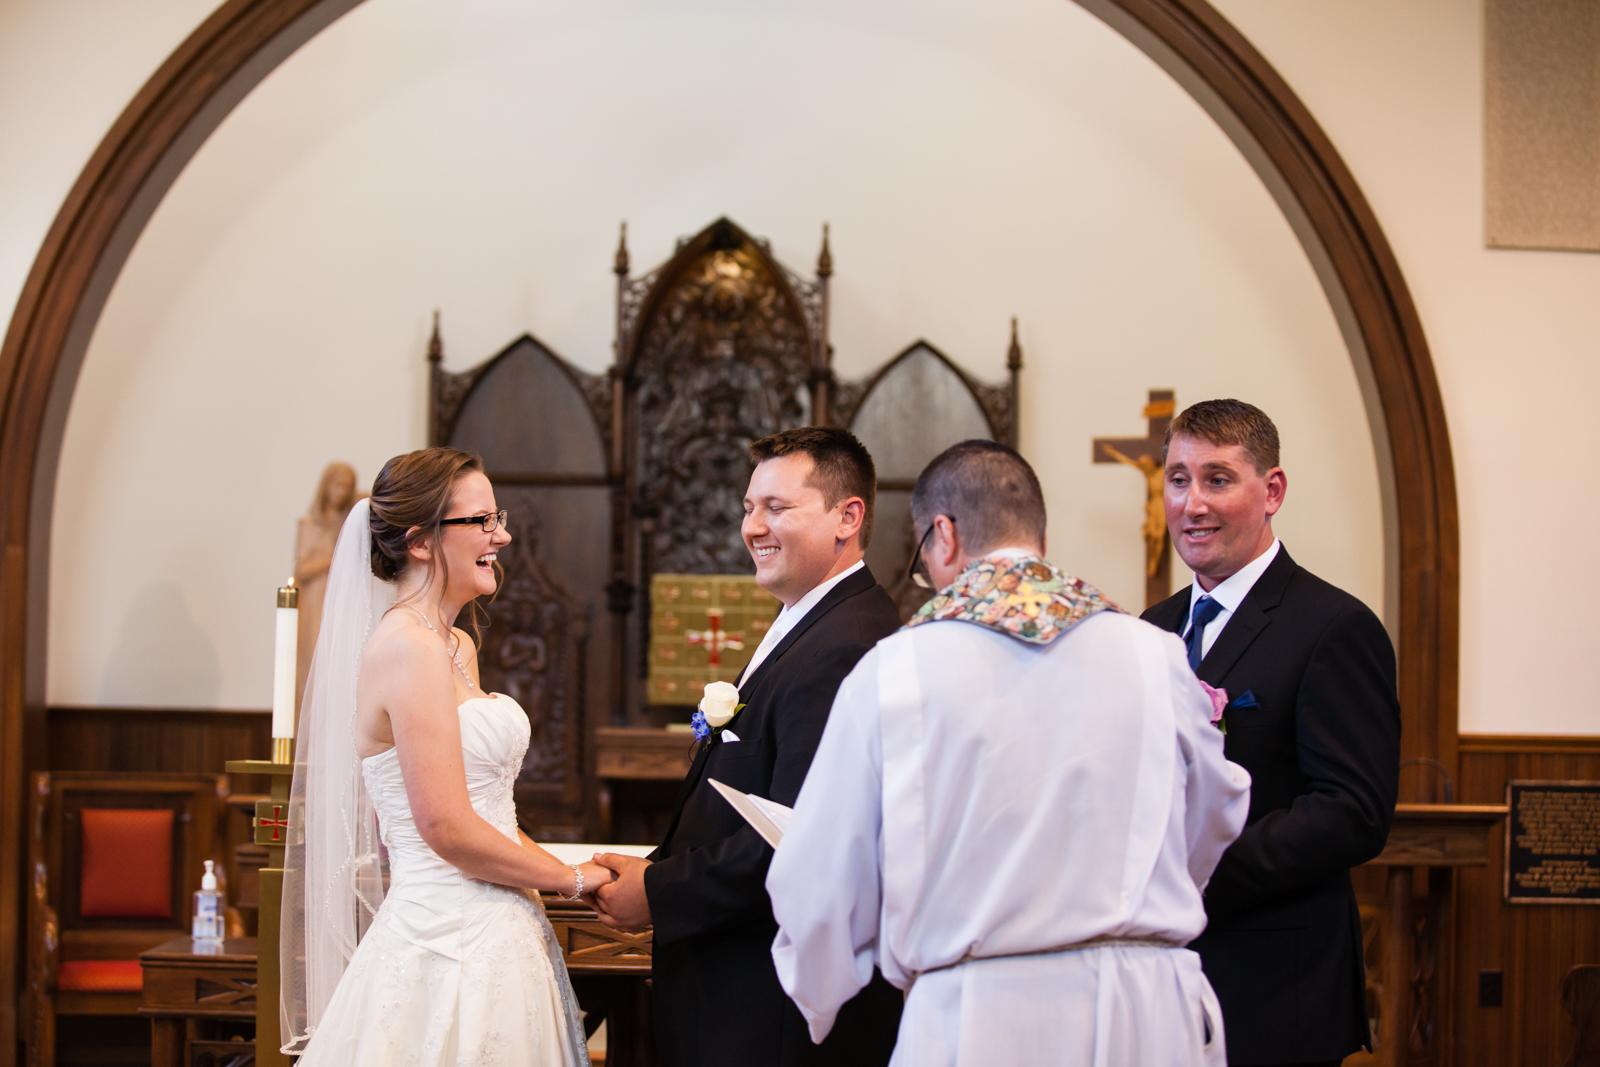 Eastons-Beach-Rotunda-Ballroom-Wedding-Newport-Rhode-Island-PhotographybyAmandaMorgan-40.jpg